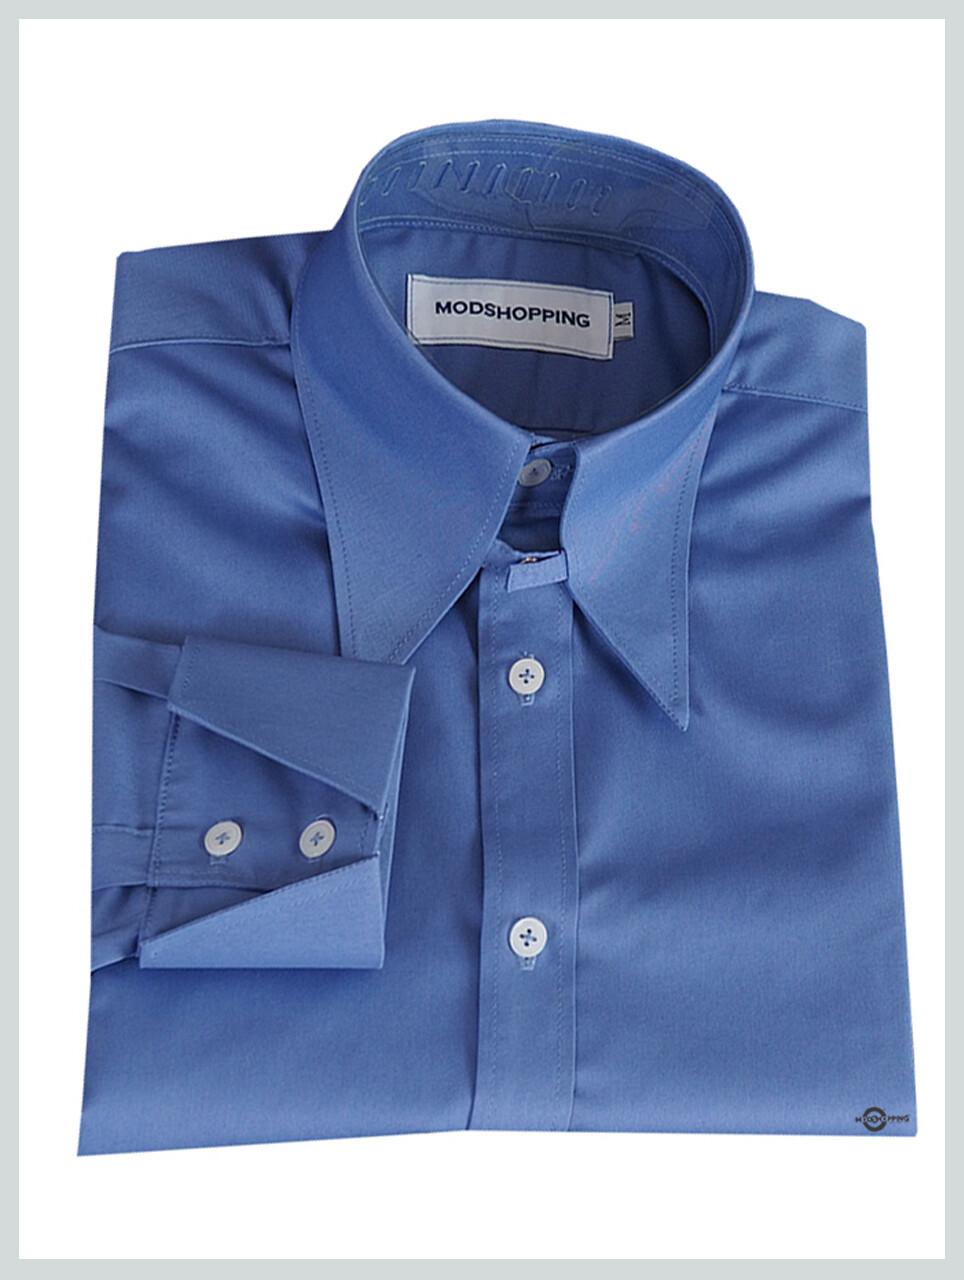 Tab Collar Shirt| 1960s Vintage Style Sky Blue Long Collar Shirt